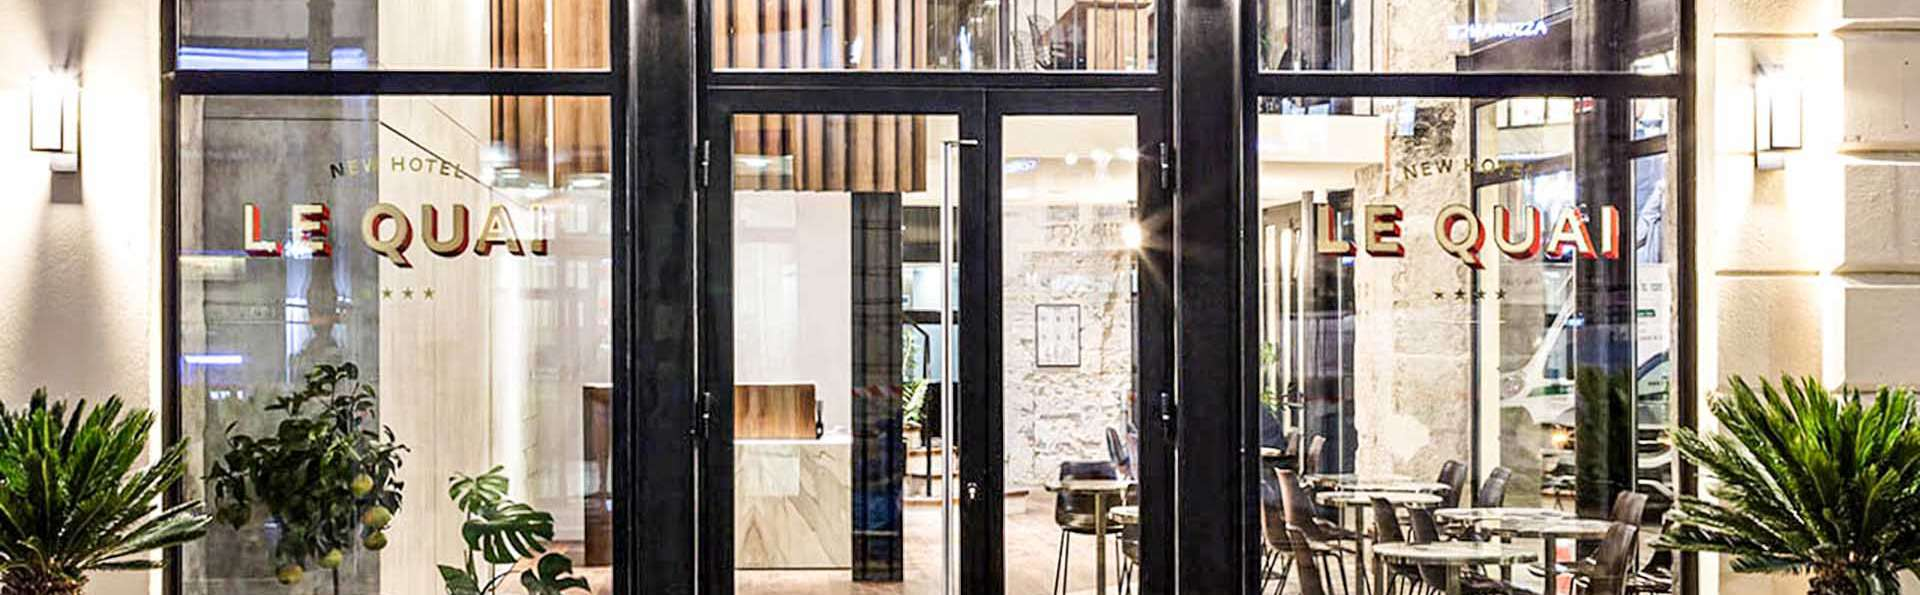 New Hotel Le Quai - Vieux Port - EDIT_ENTREE_NUIT_NHLQ_01.jpg